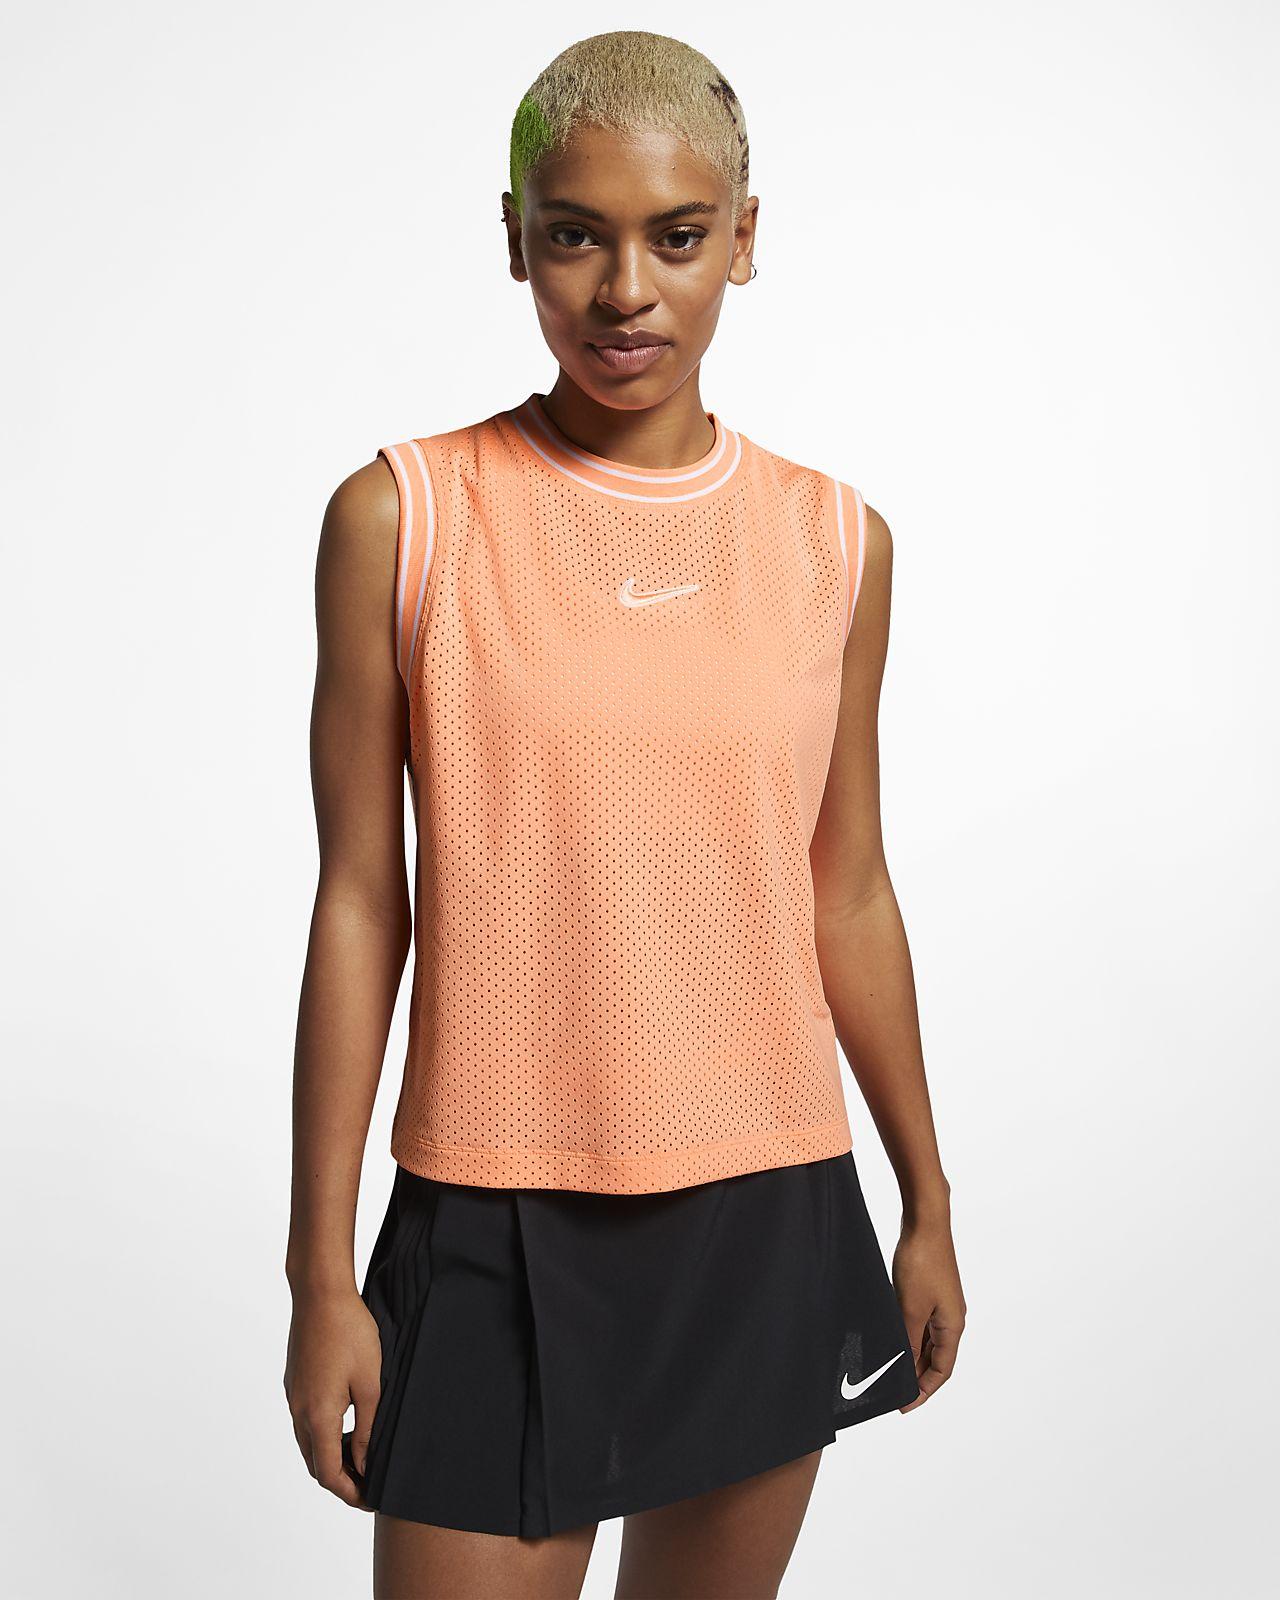 NikeCourt Women's Tennis Tank